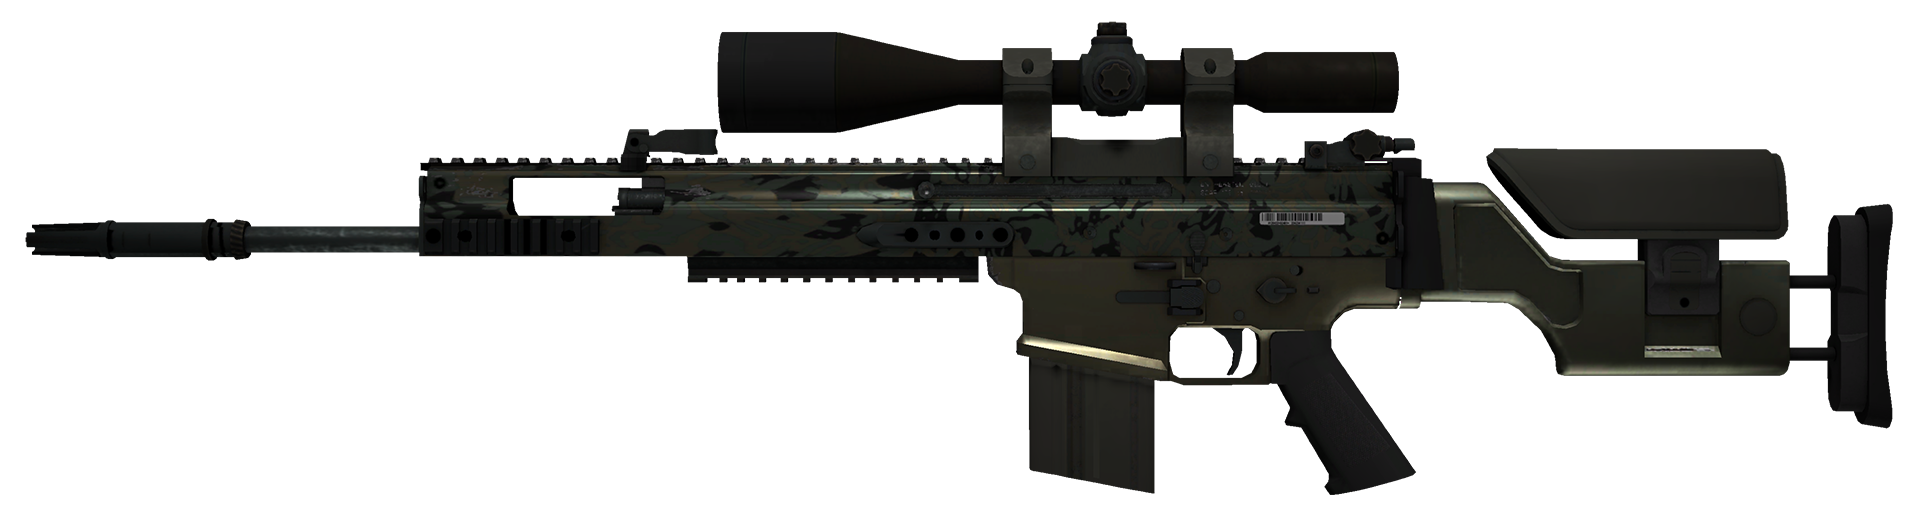 SCAR-20 Army Sheen Large Rendering